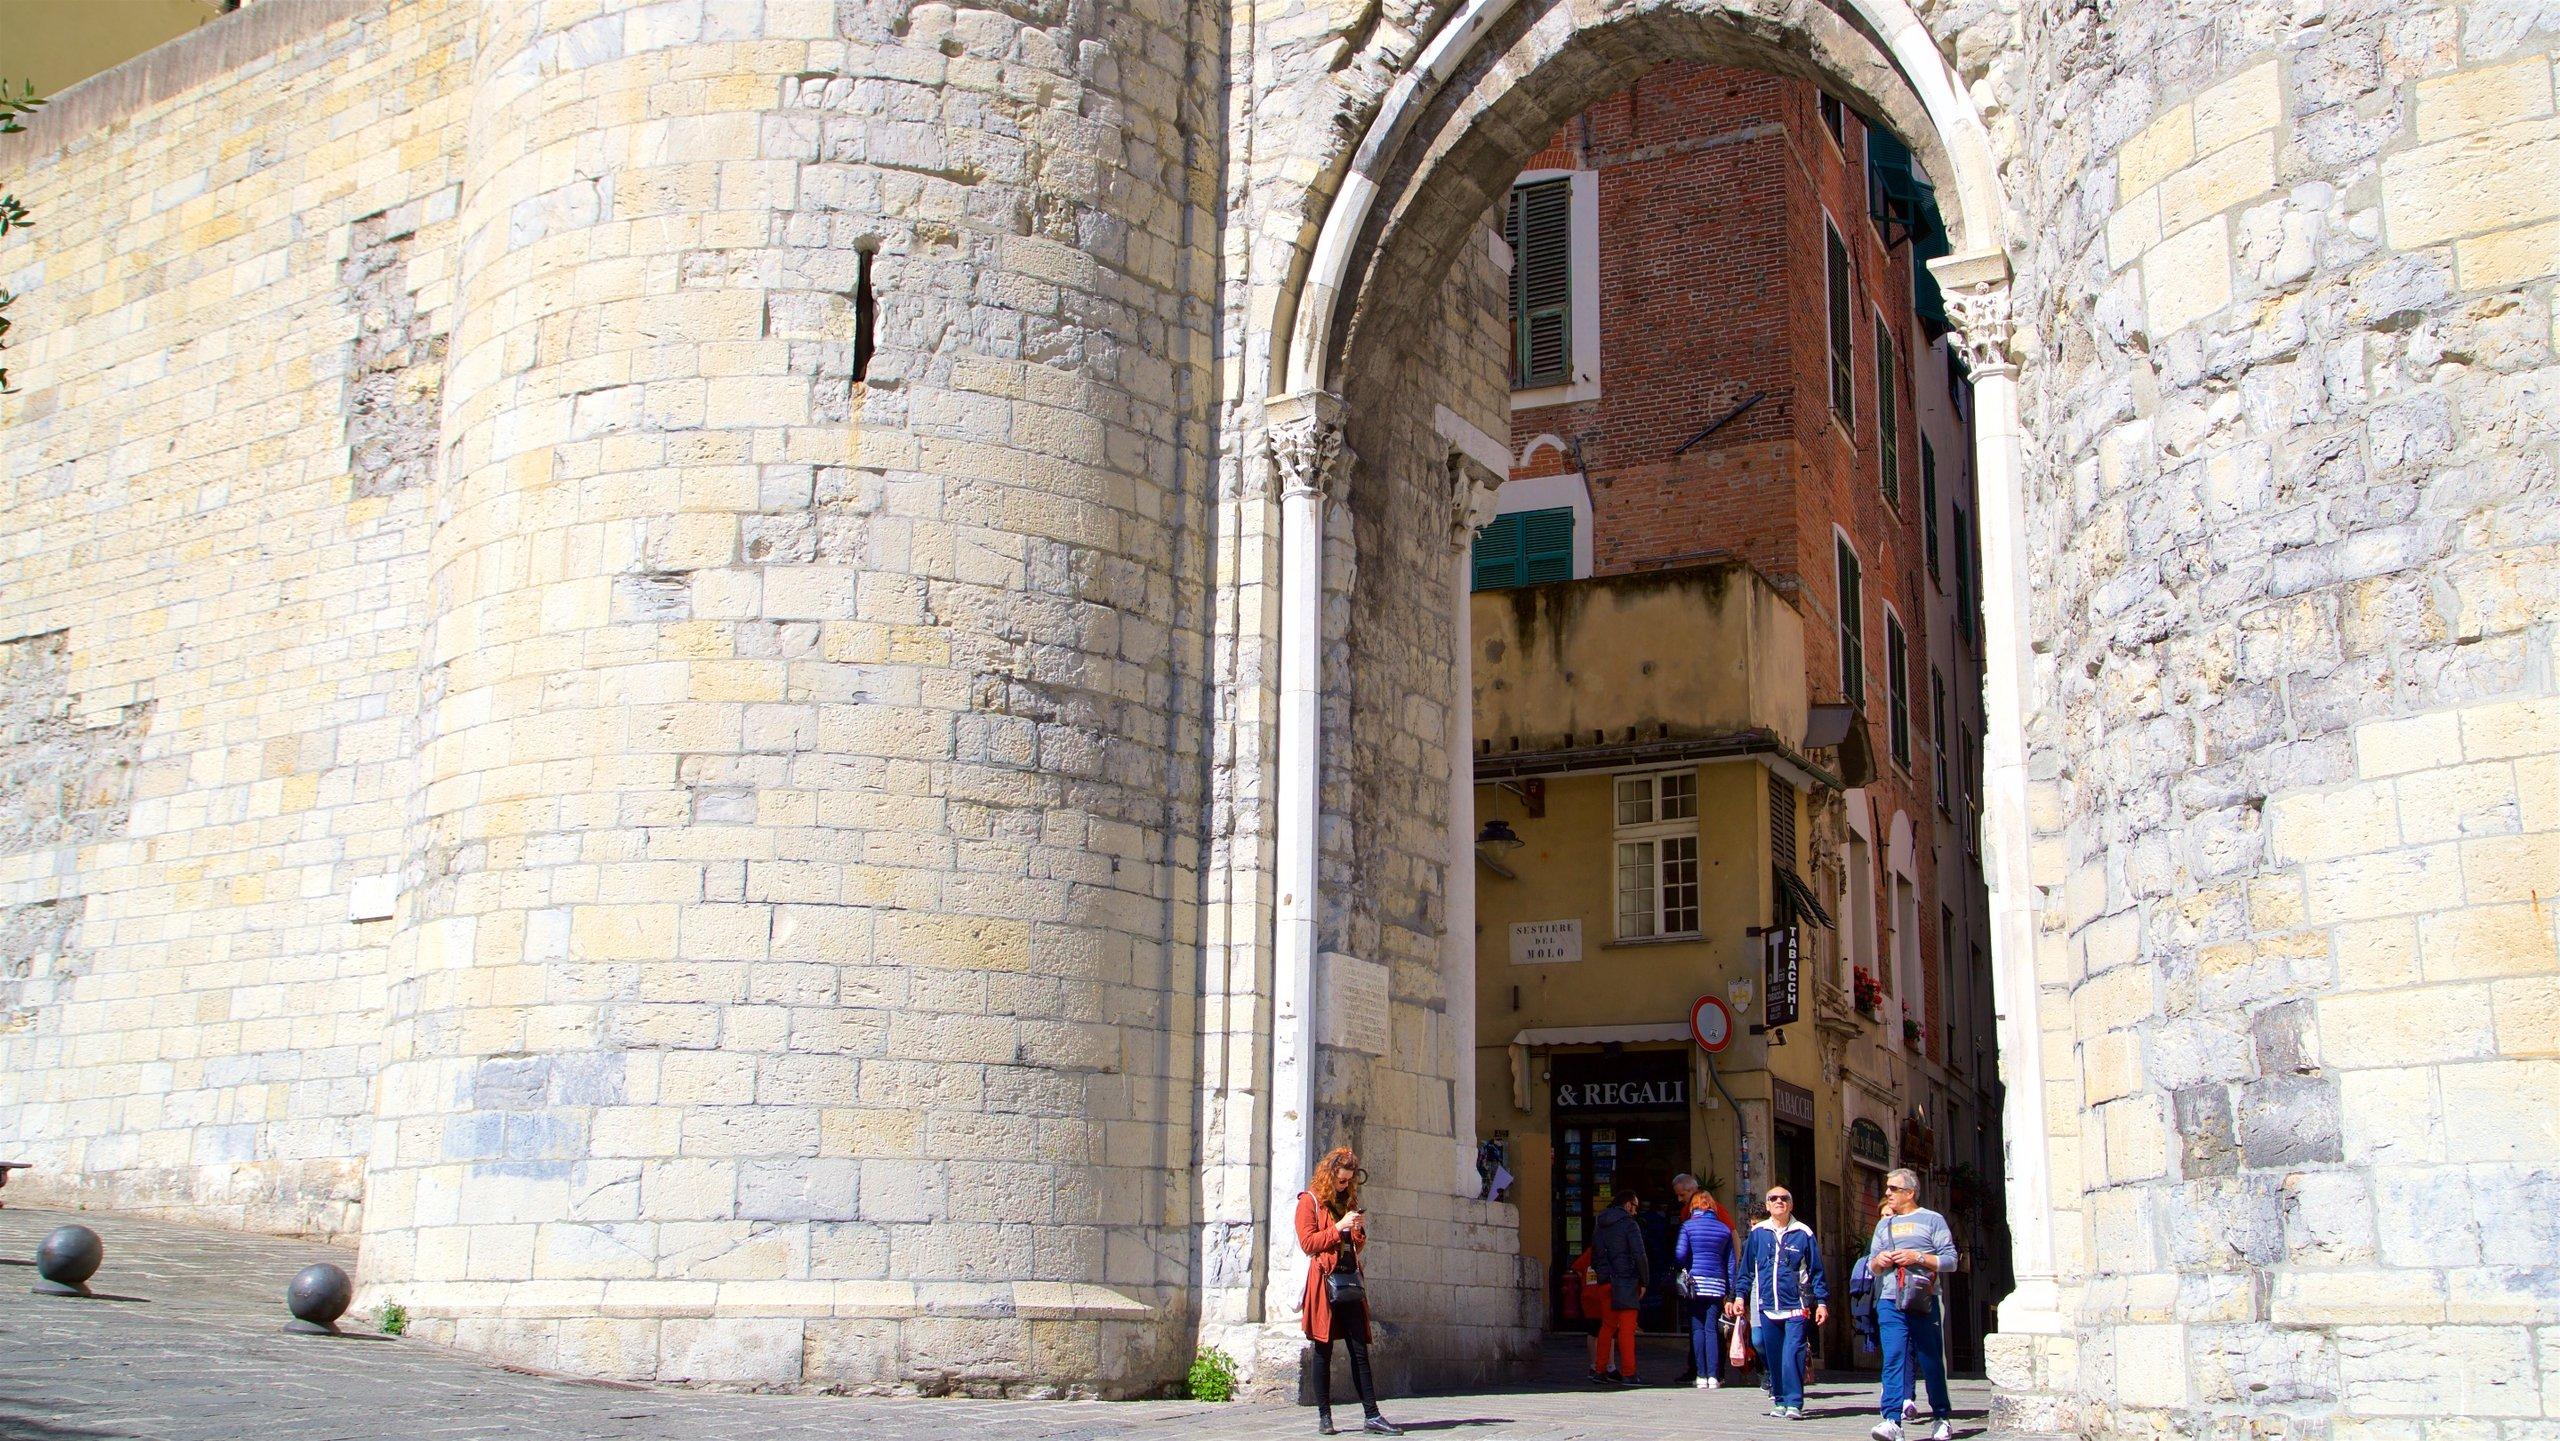 Middeleeuwse poort (Porta Soprana), Genova, Ligurië, Italië